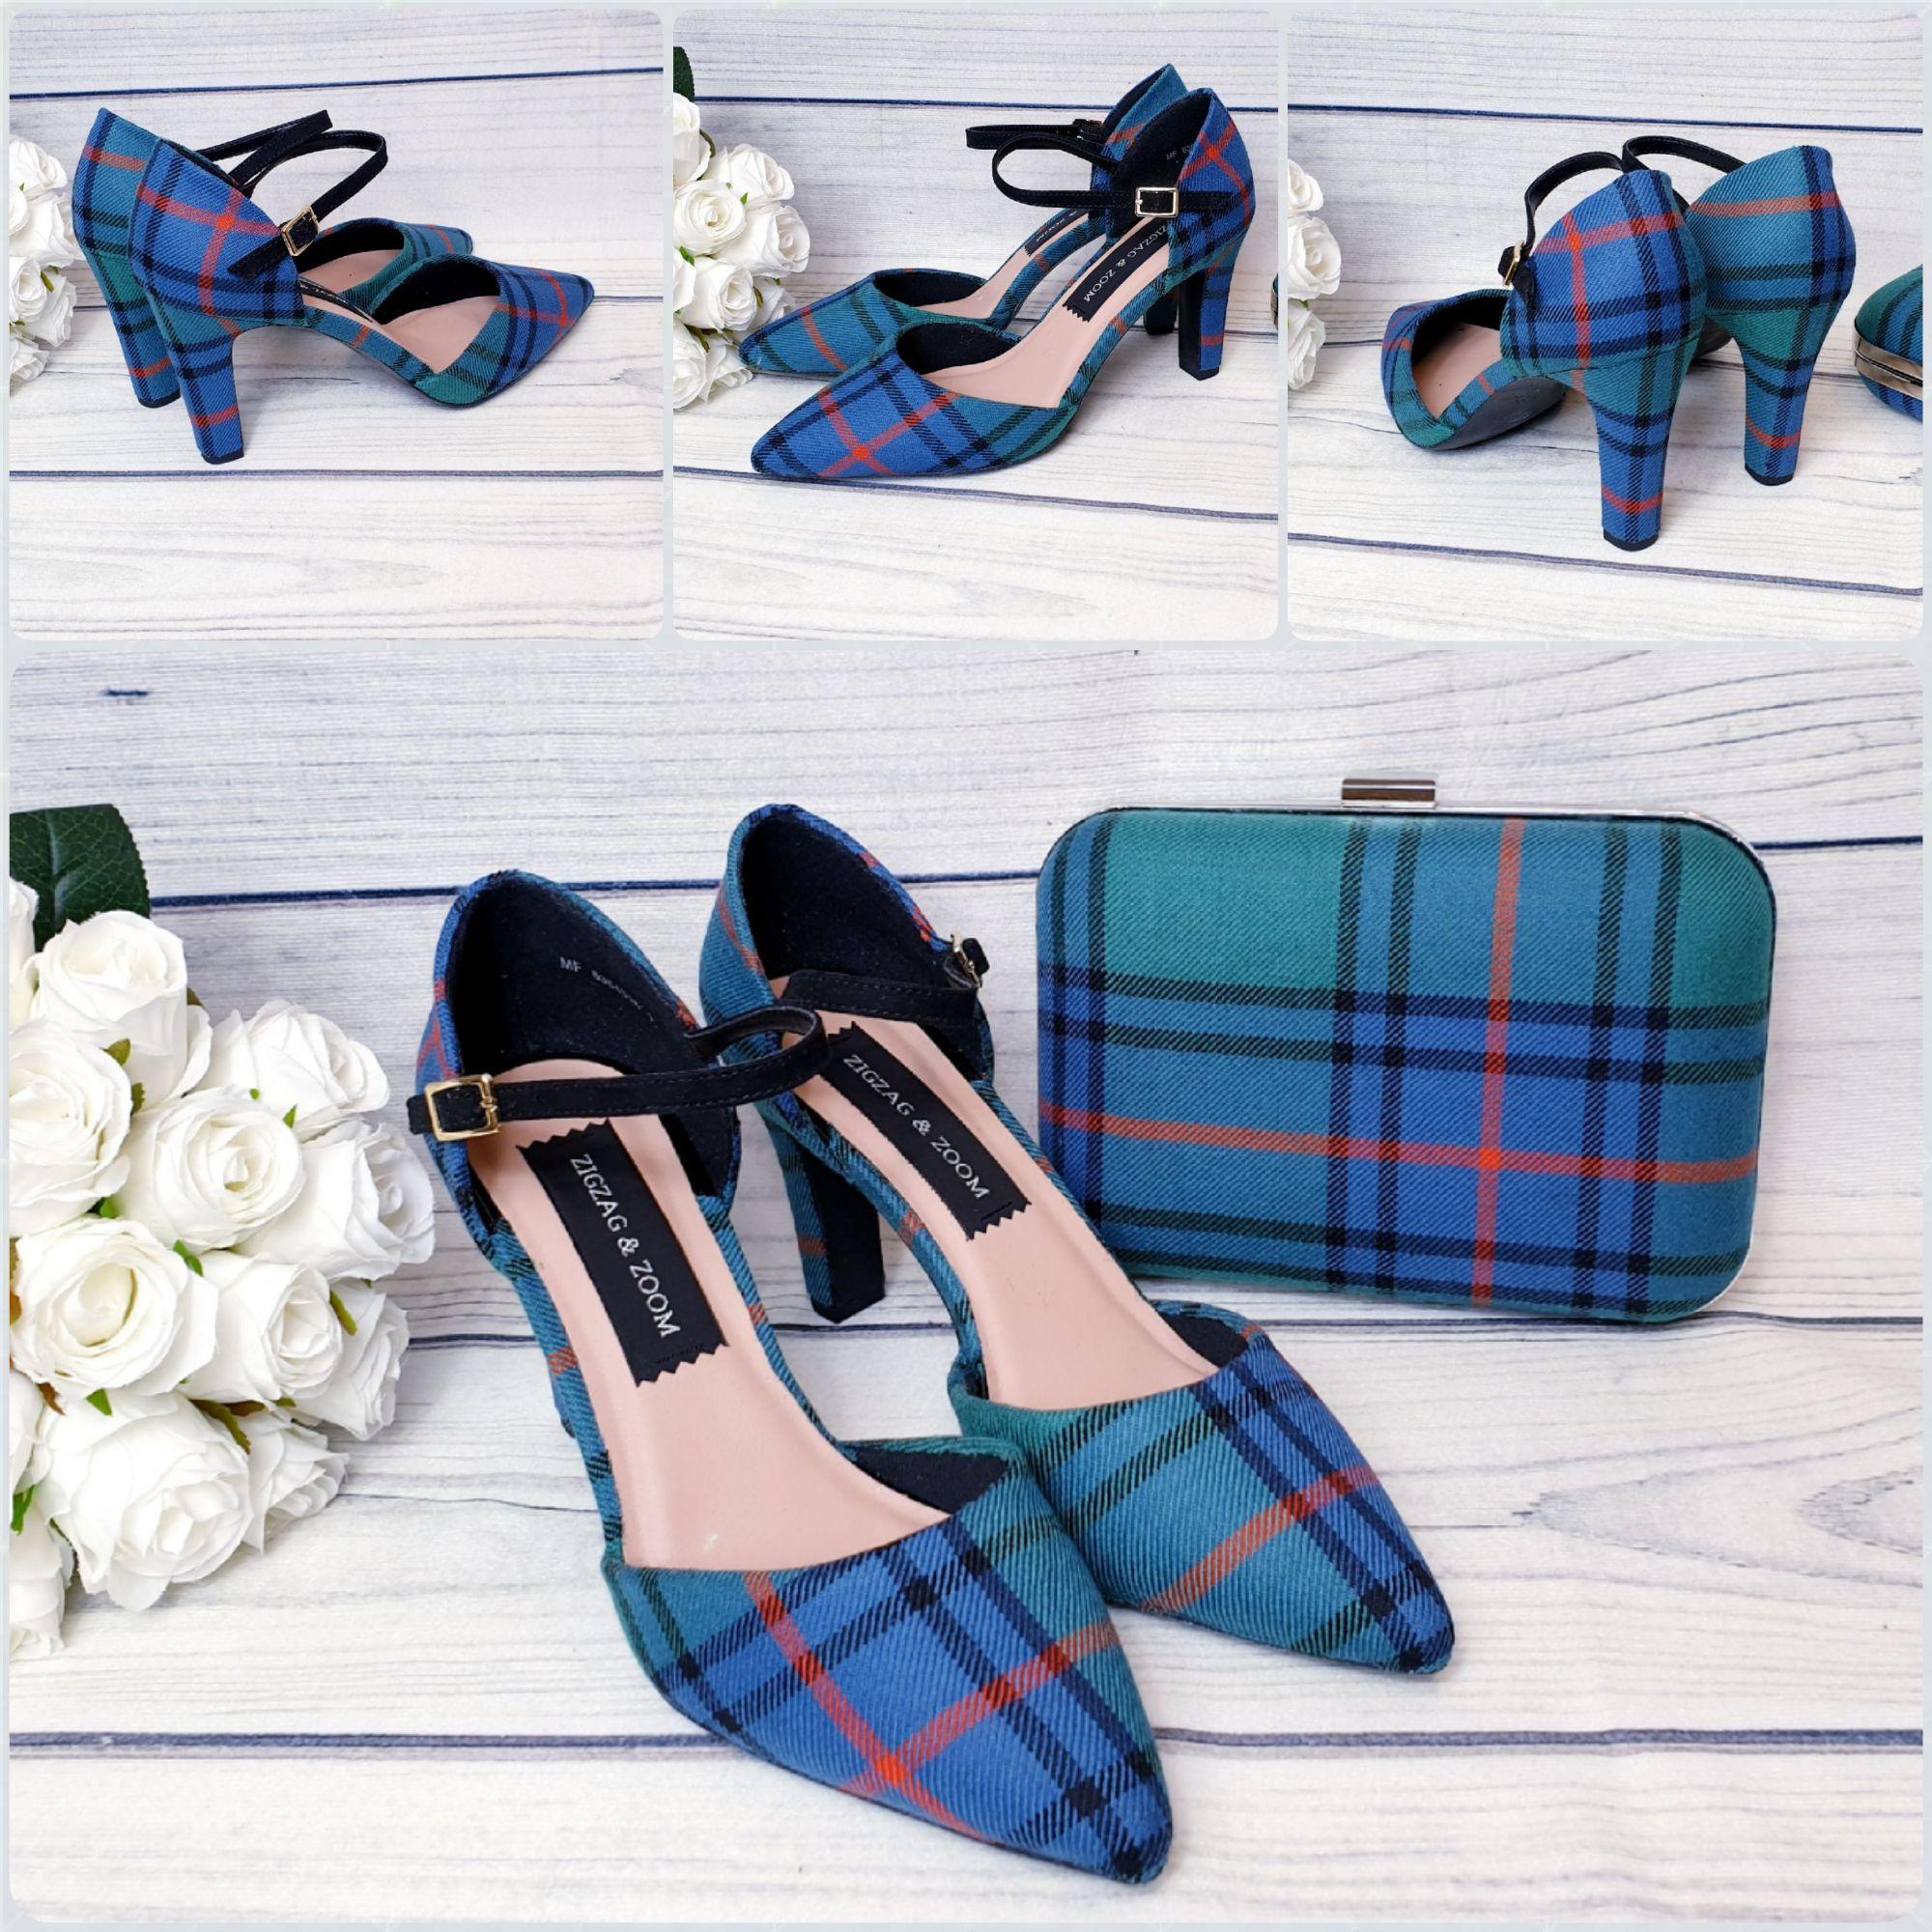 Tartan shoes and matching tartan clutch bag